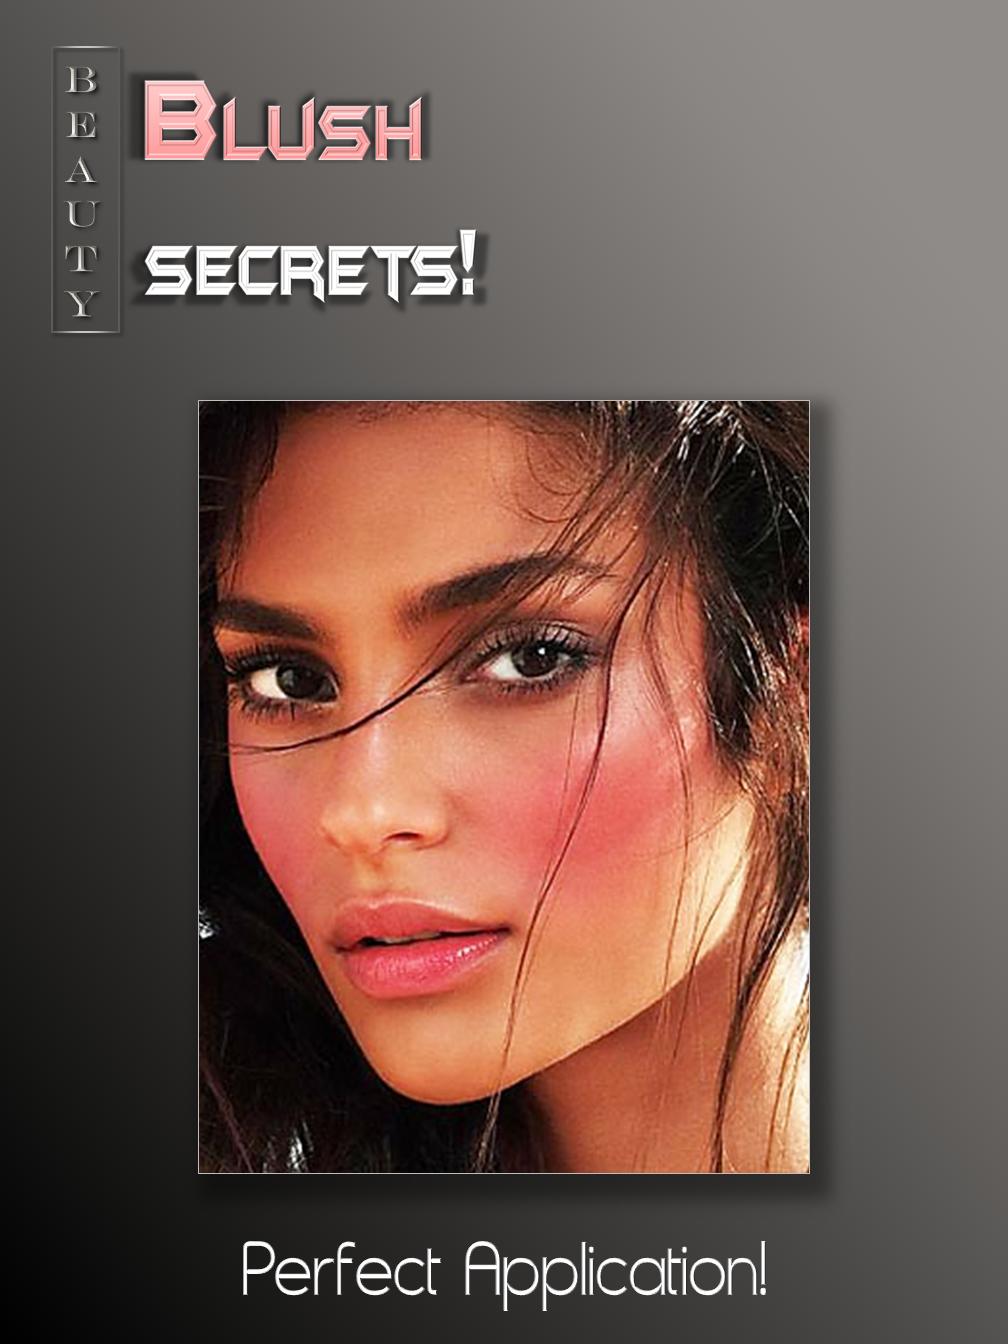 Blush Secrets